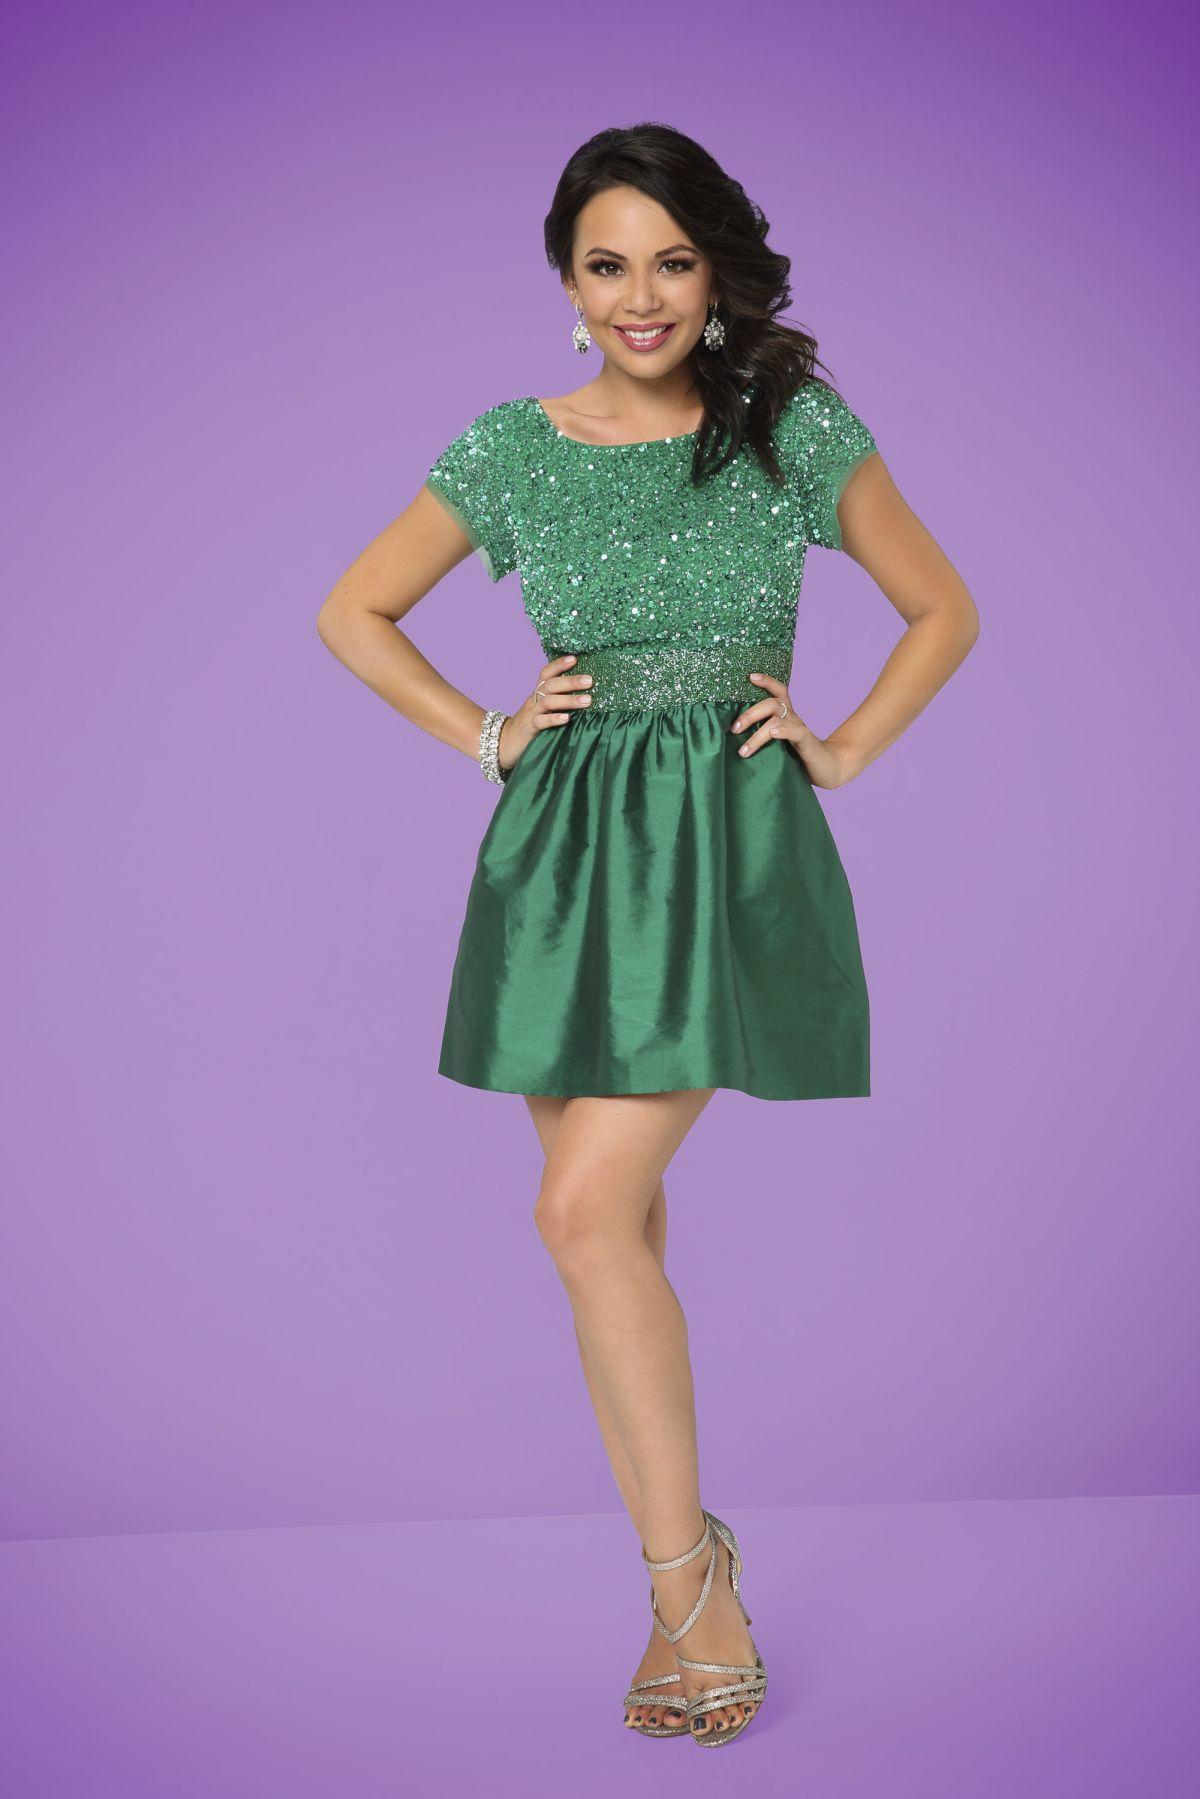 JANEL PARISH - Dancing With the Stars, Season 19 Promos